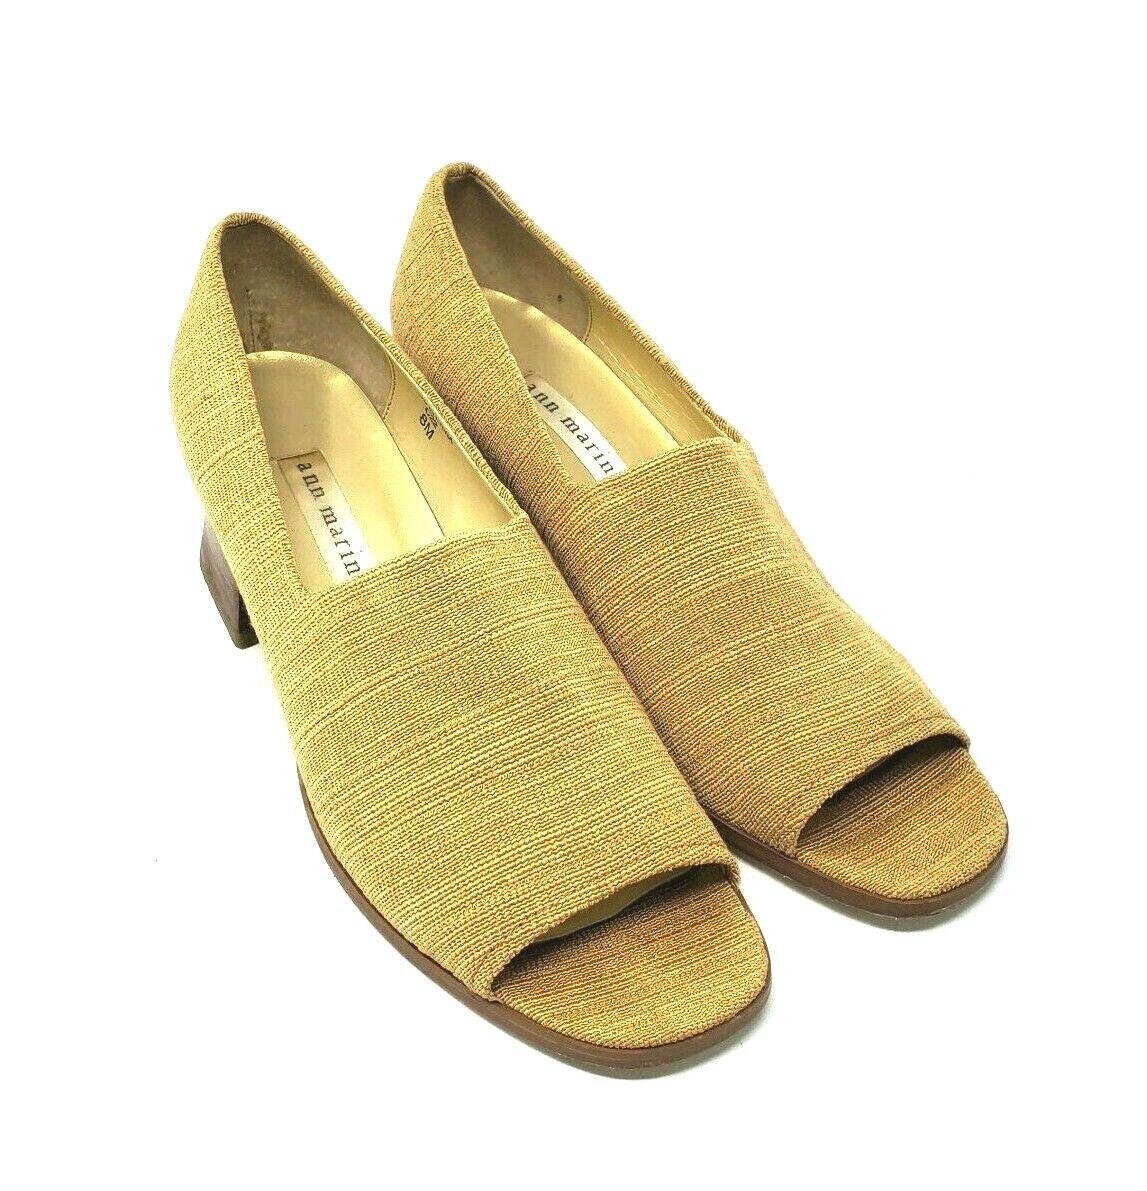 Ann Marino Mustard Yellow Tweed Textile Peep Toe Wood Block Heels